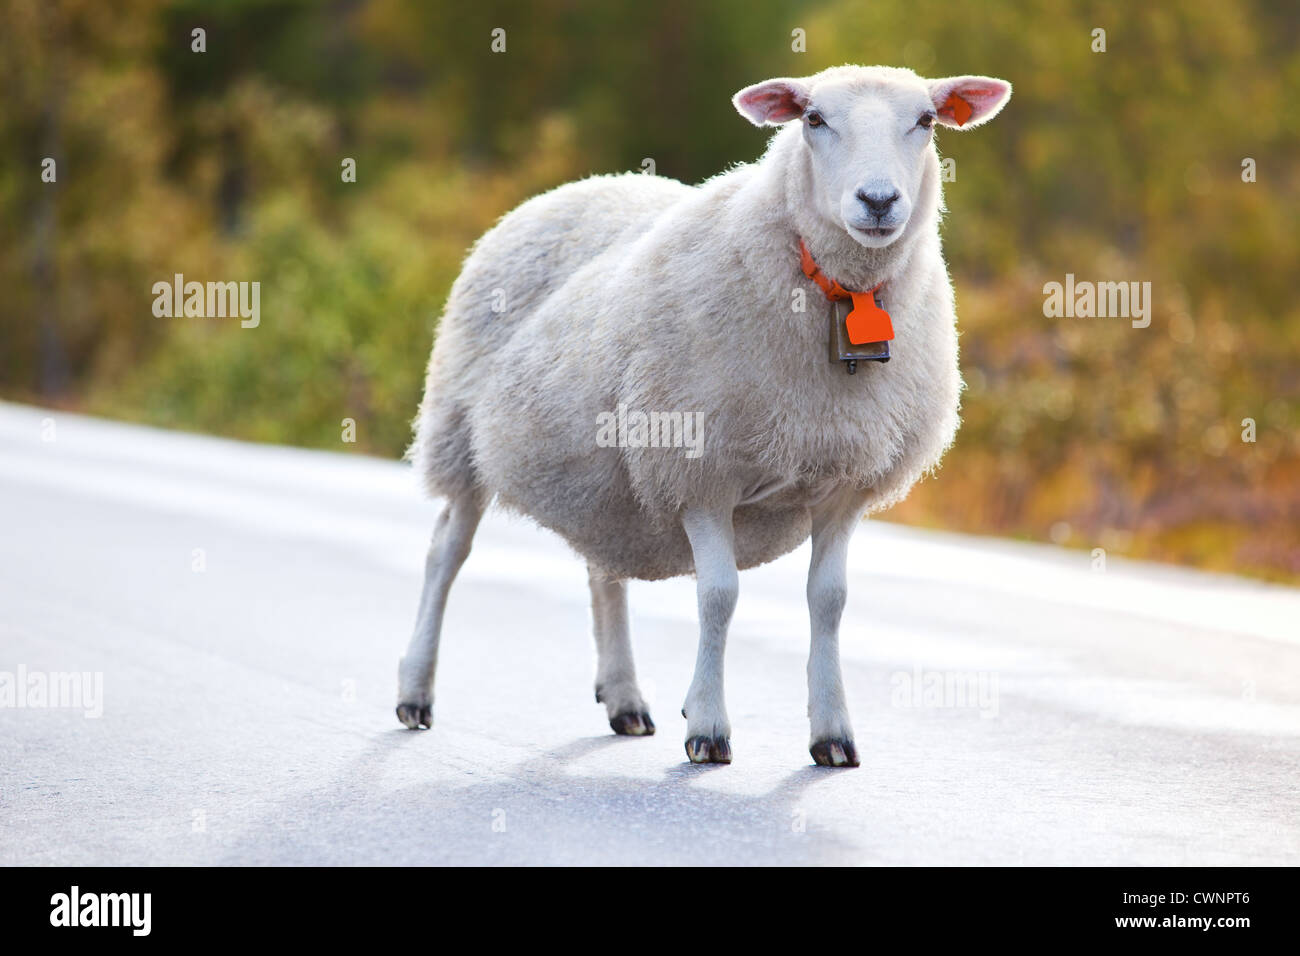 Sheep walking on road in Norway - Stock Image